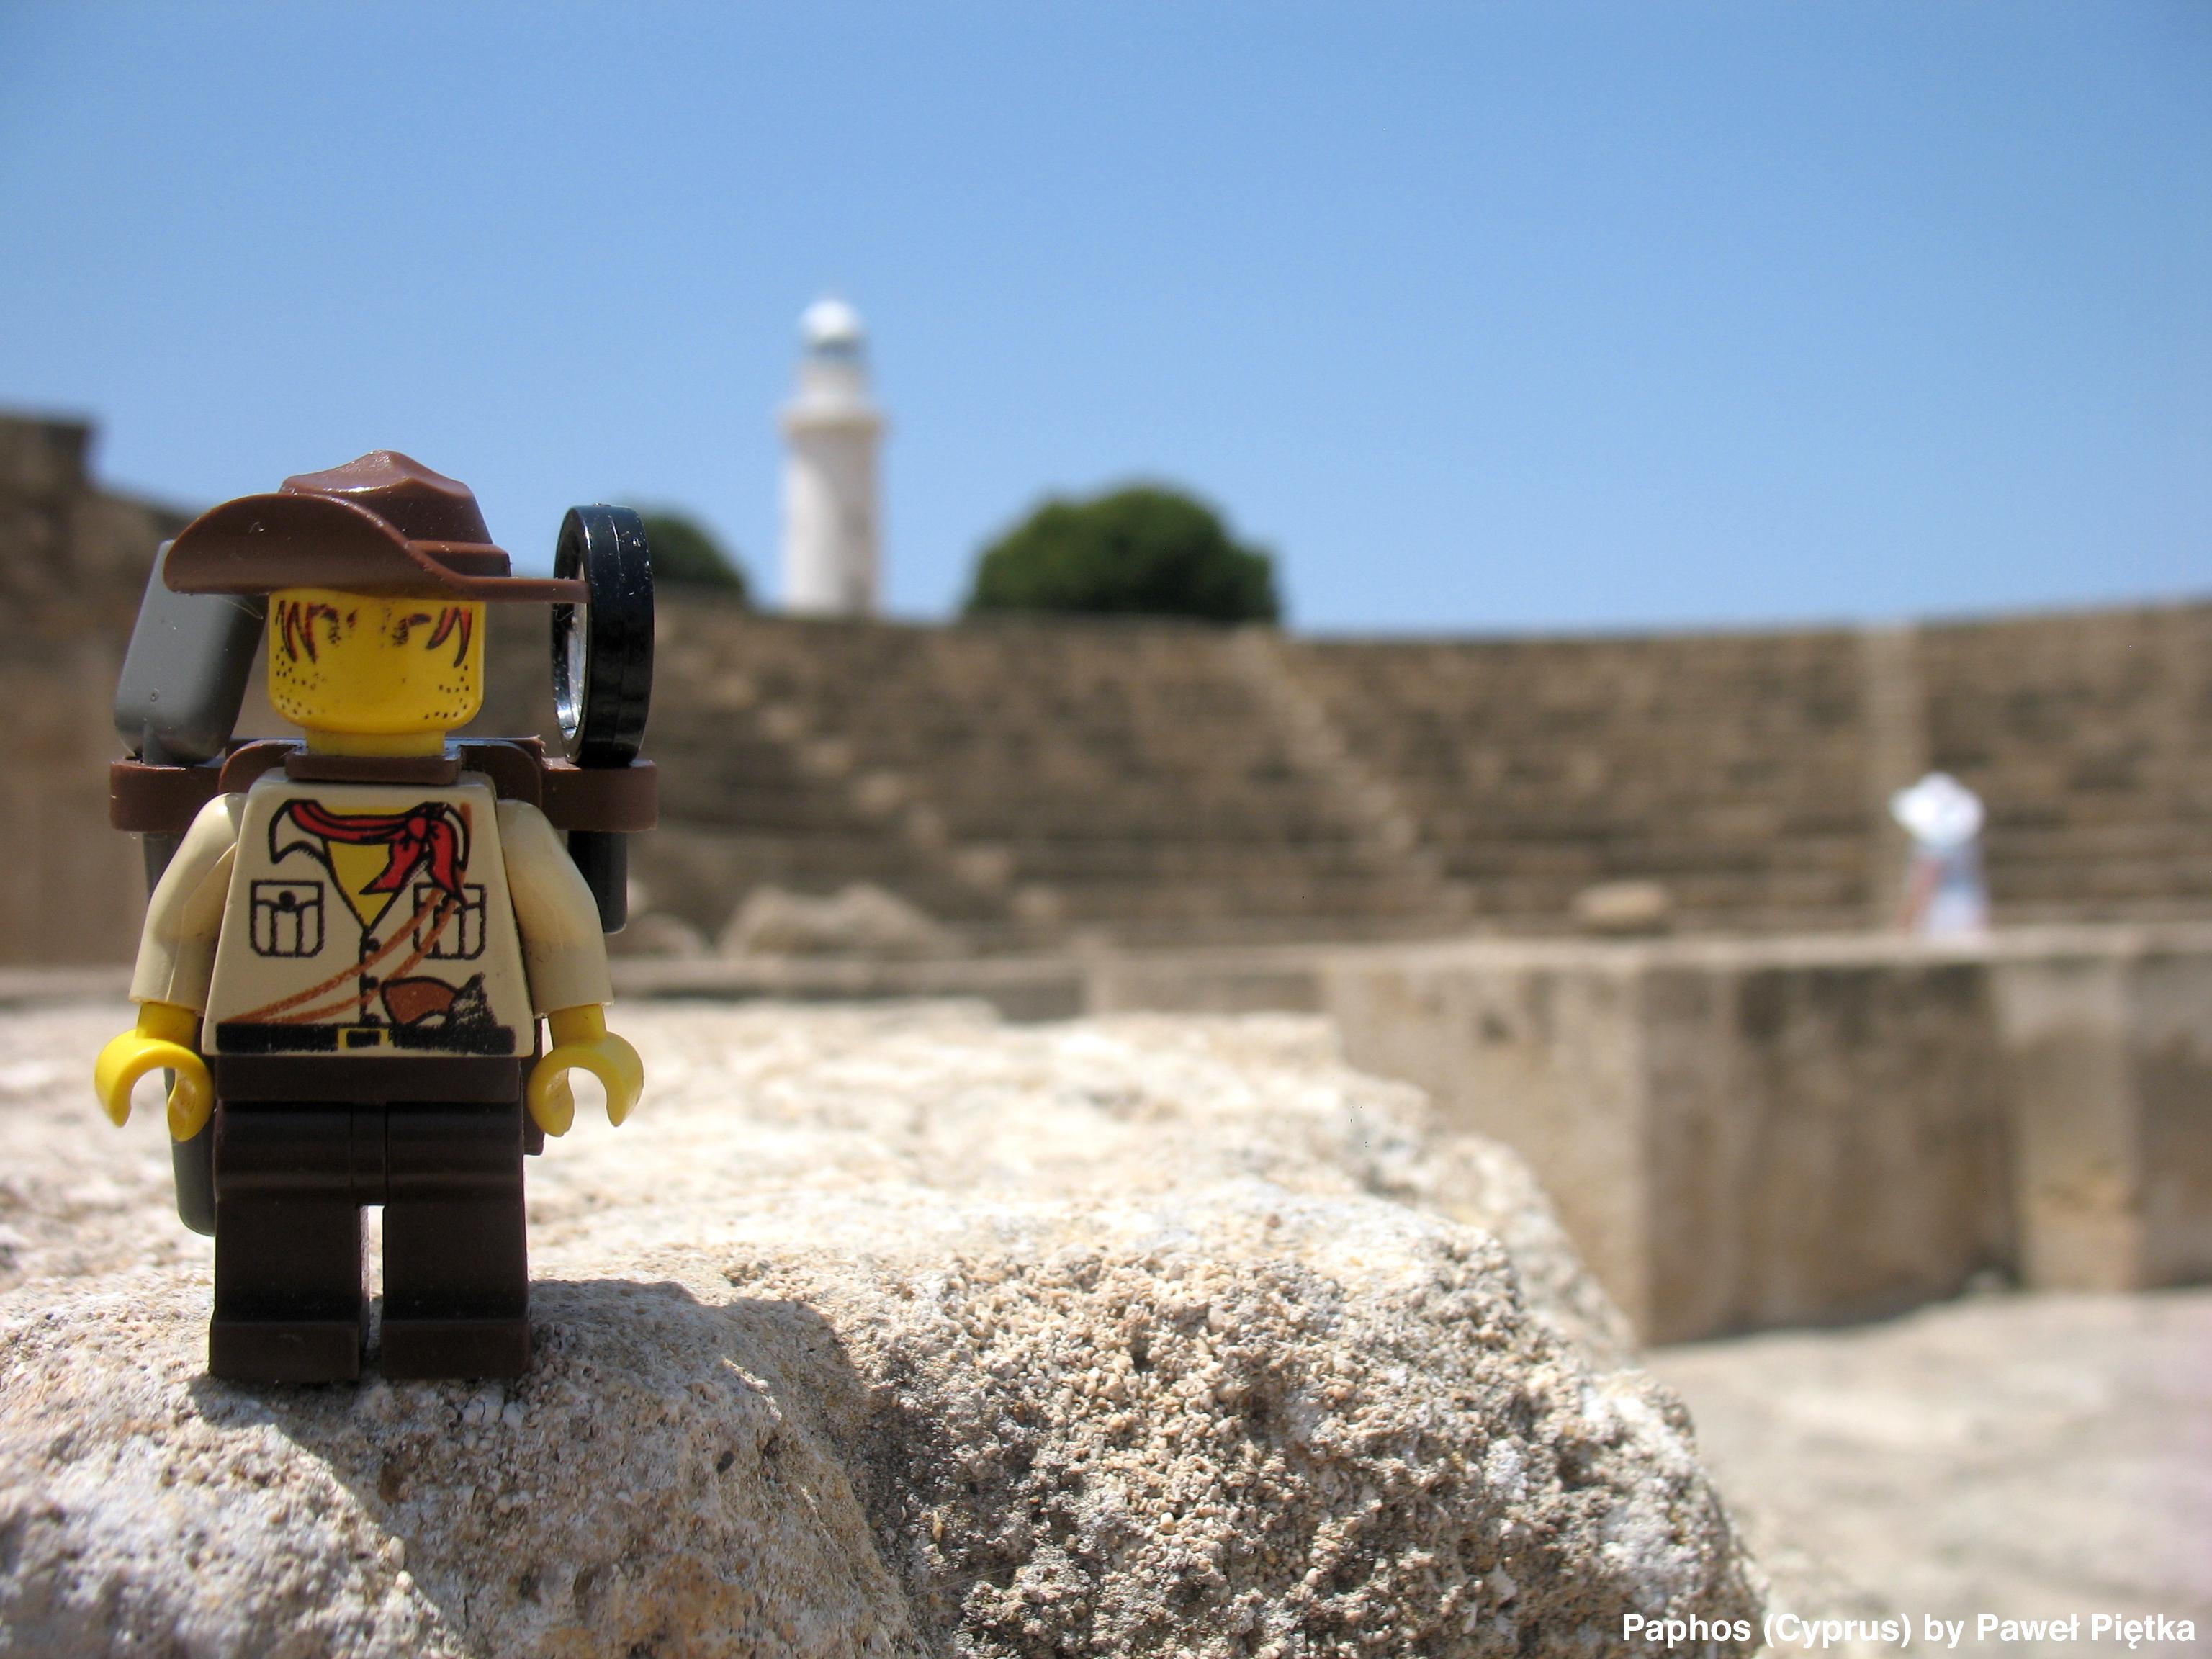 Paphos (Cyprus) - Odeon Amphitheatre